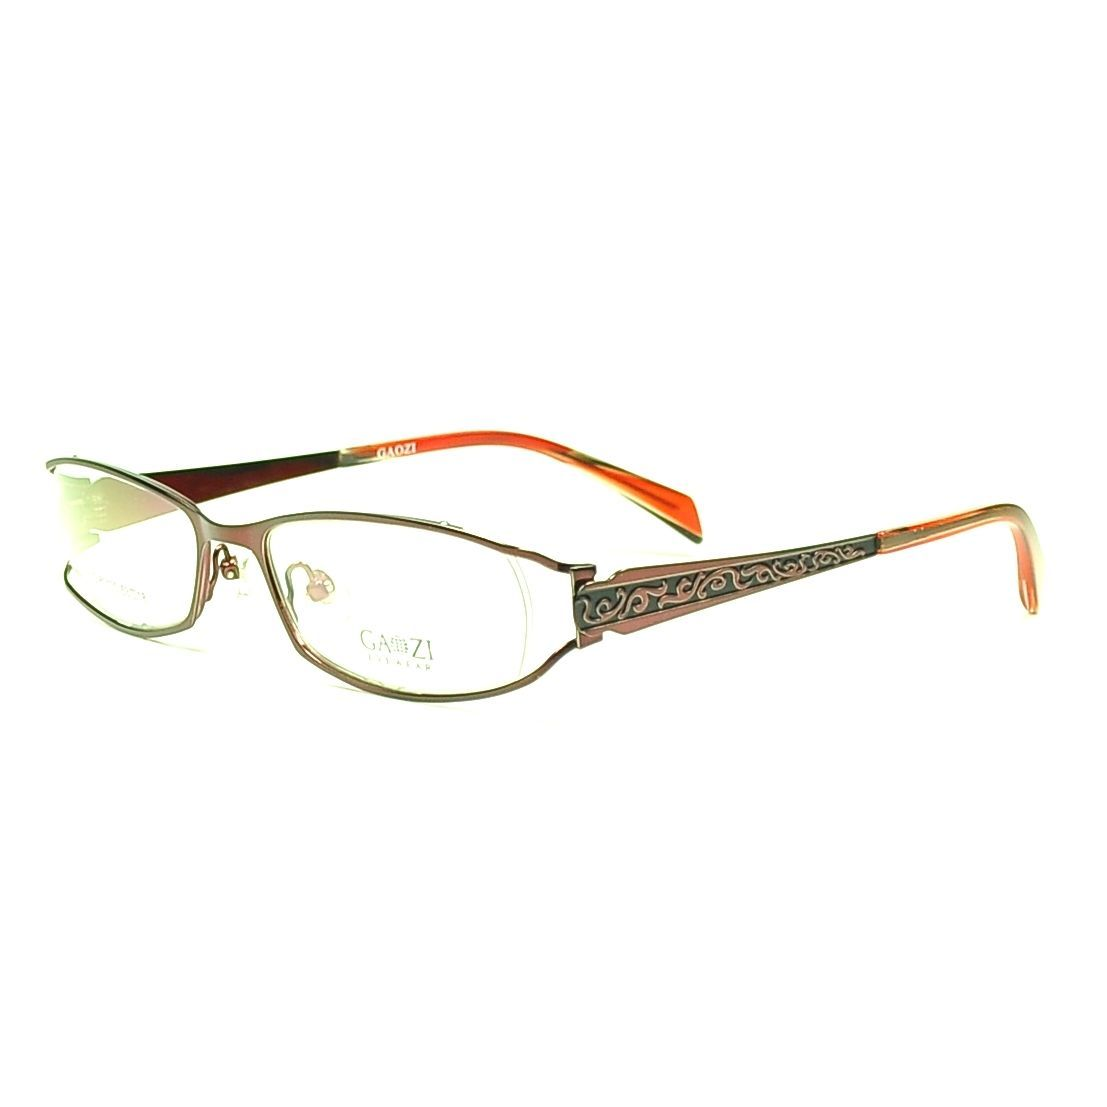 ffeab67082d1 Classic Eyeglasses For Women